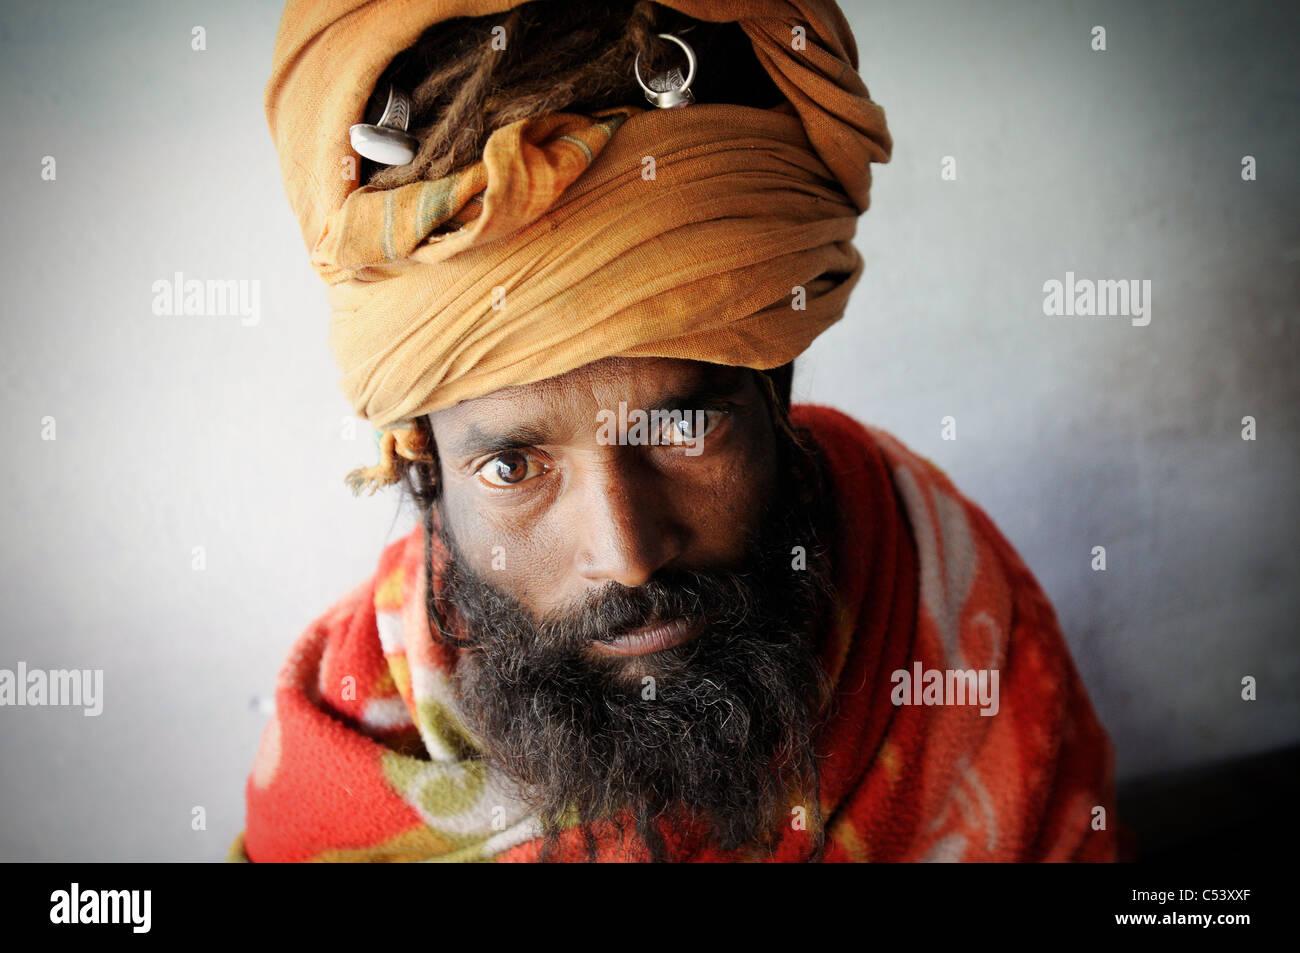 A sadhu (Hindu holy man) at the Kumbh Mela festival in India. - Stock Image